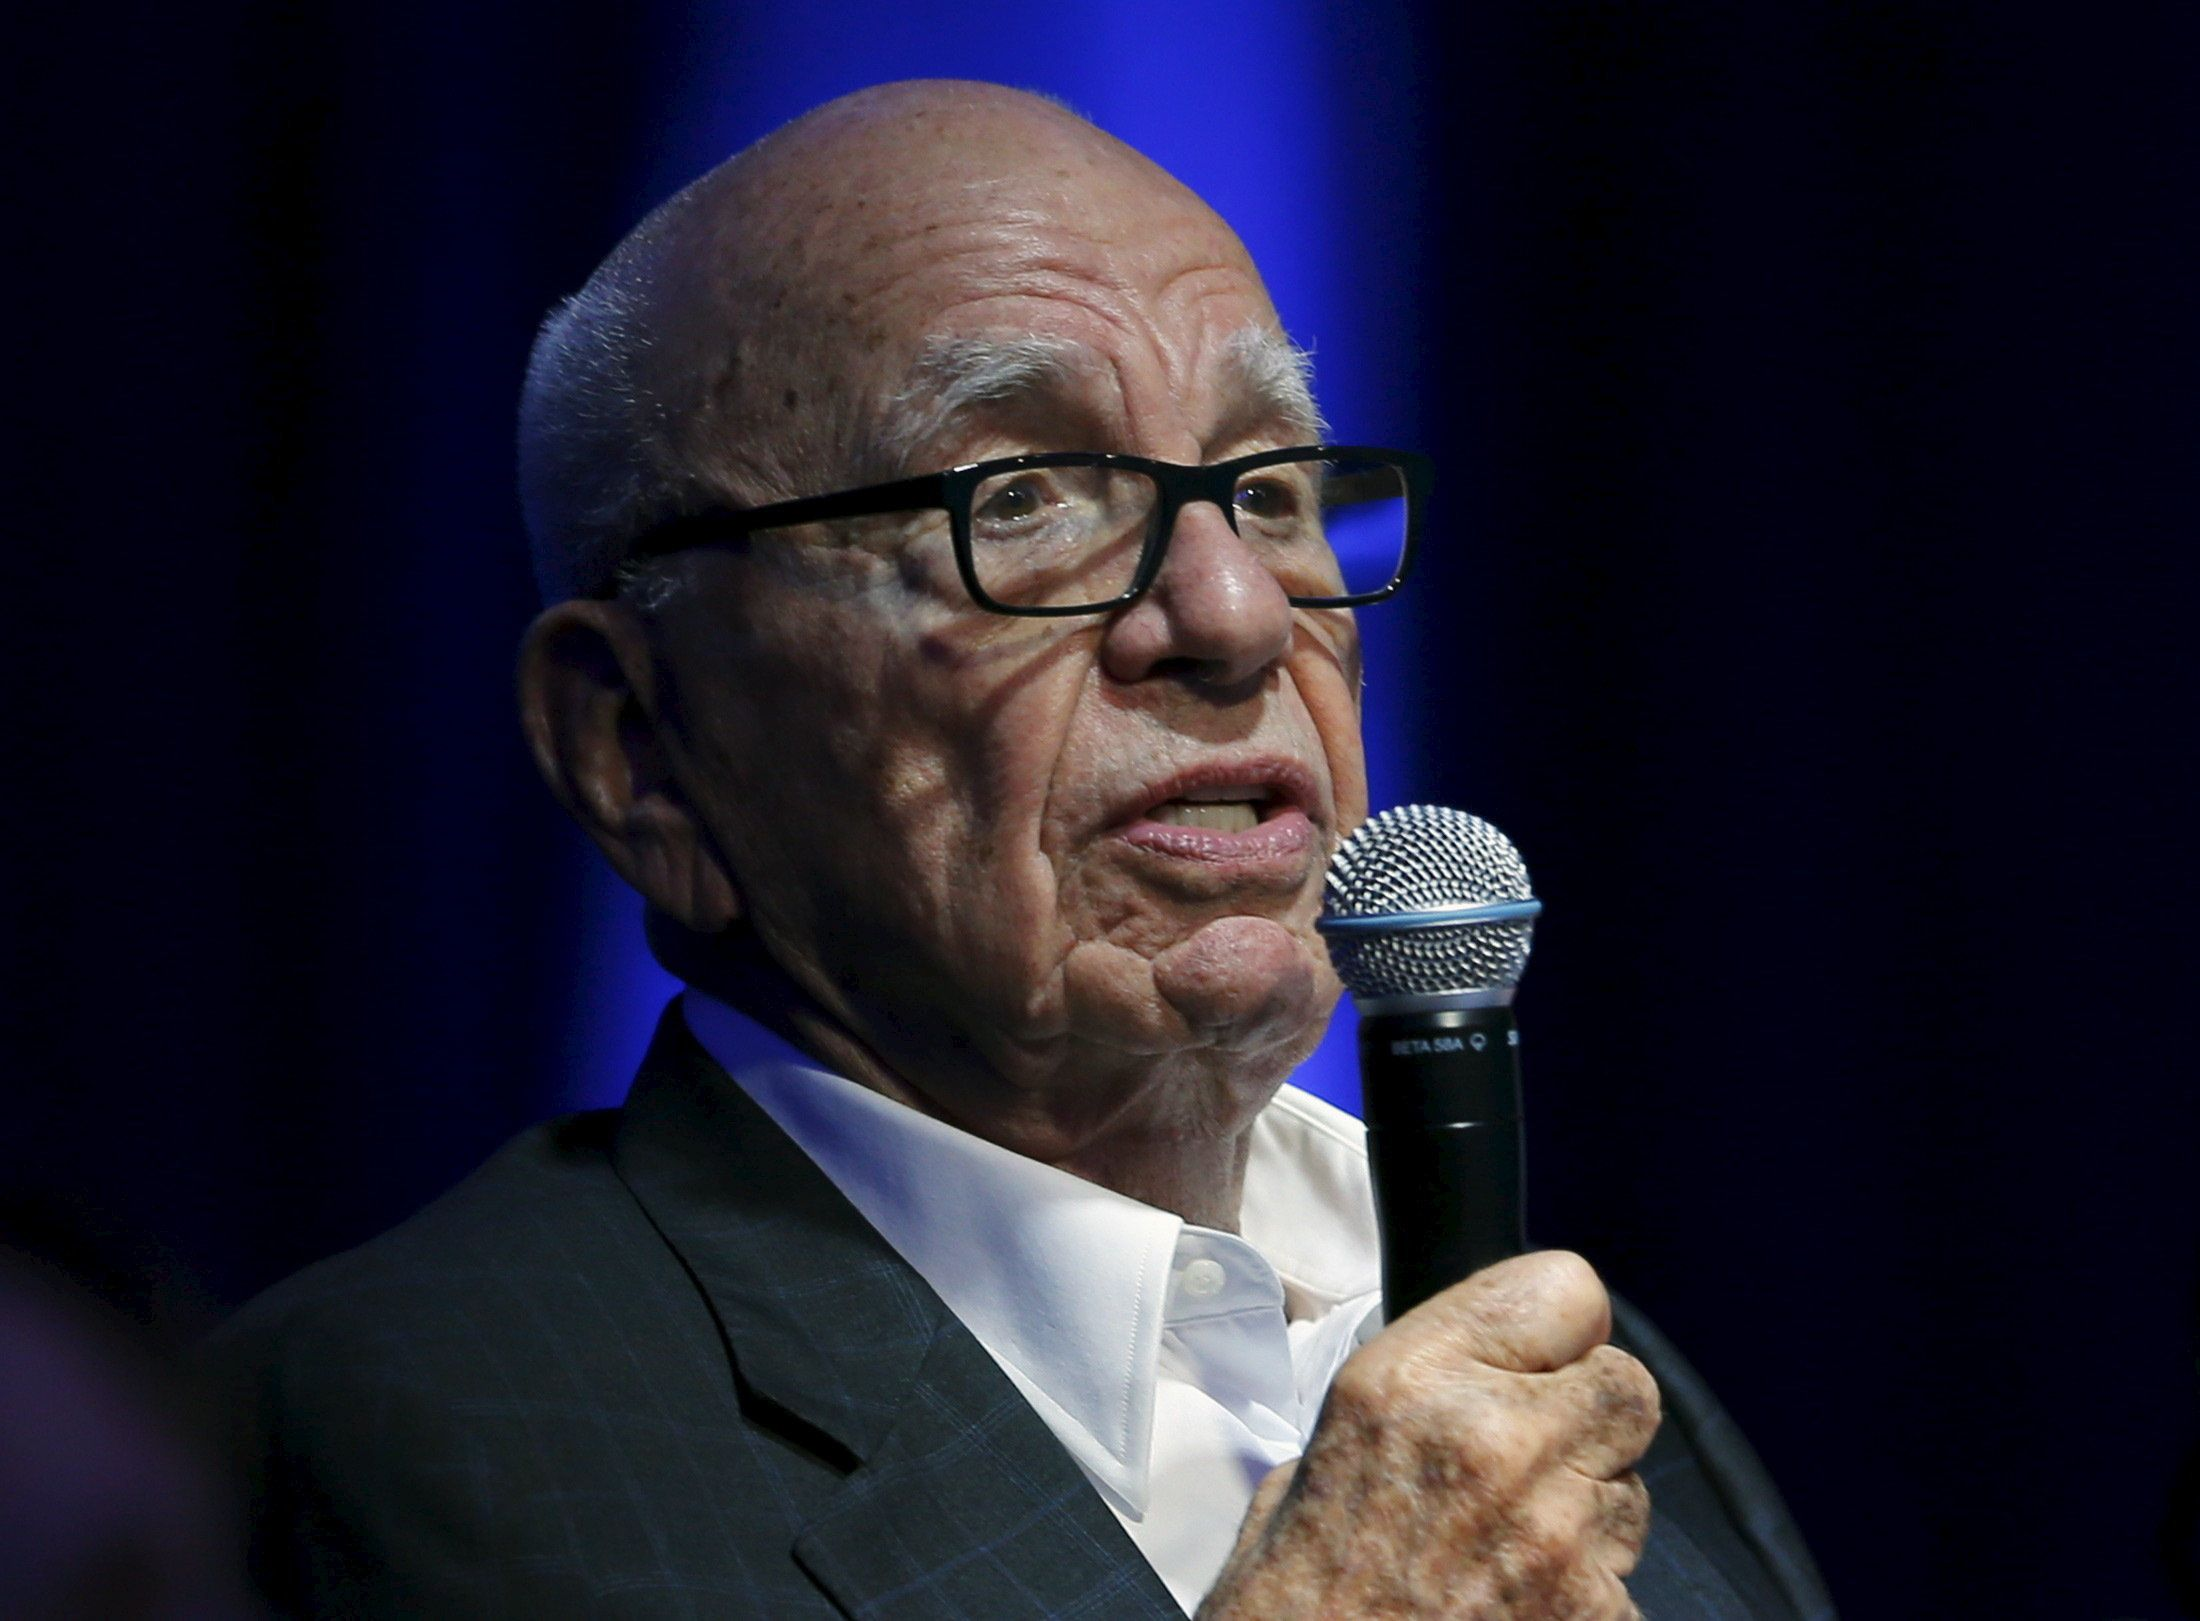 Murdoch's New Sky Bid Should Be Probed, UK Opposition Politicians